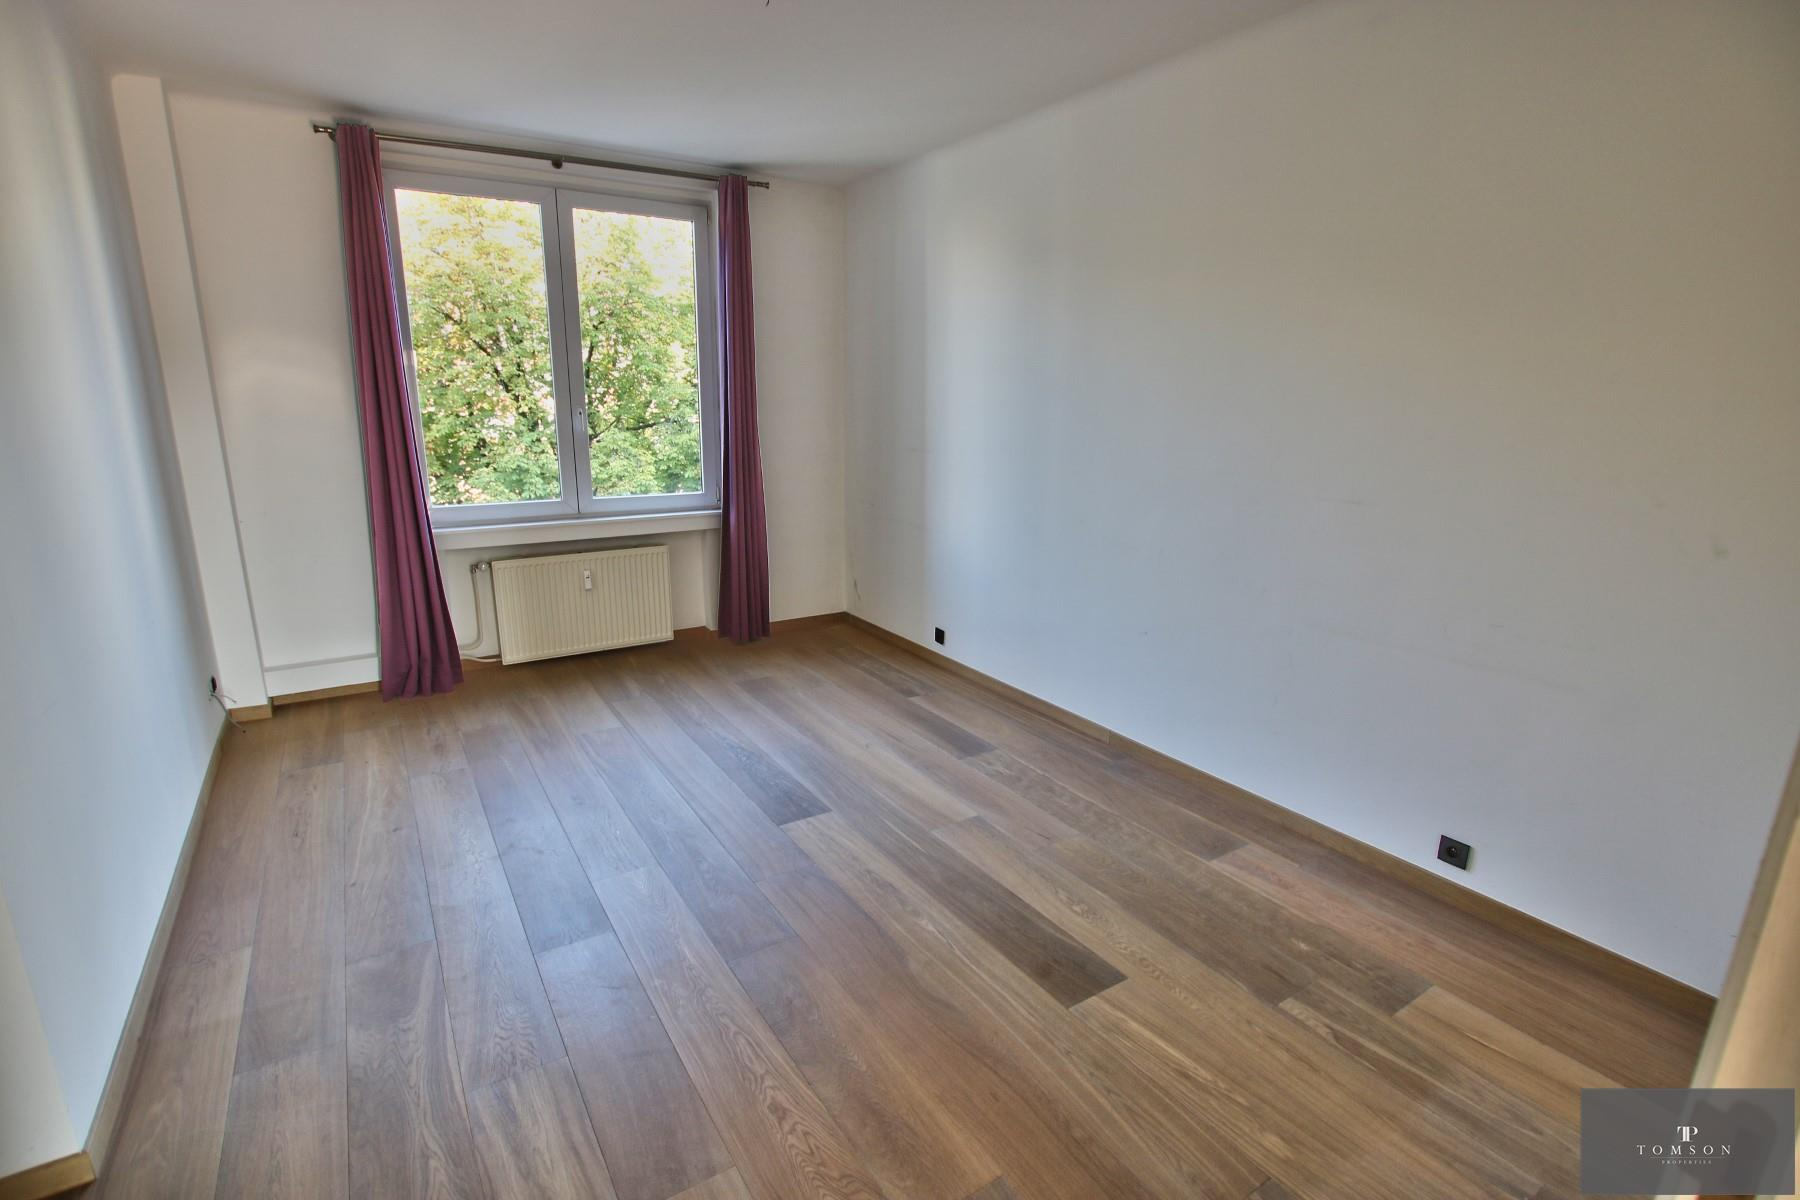 Flat - Etterbeek - #4154759-7